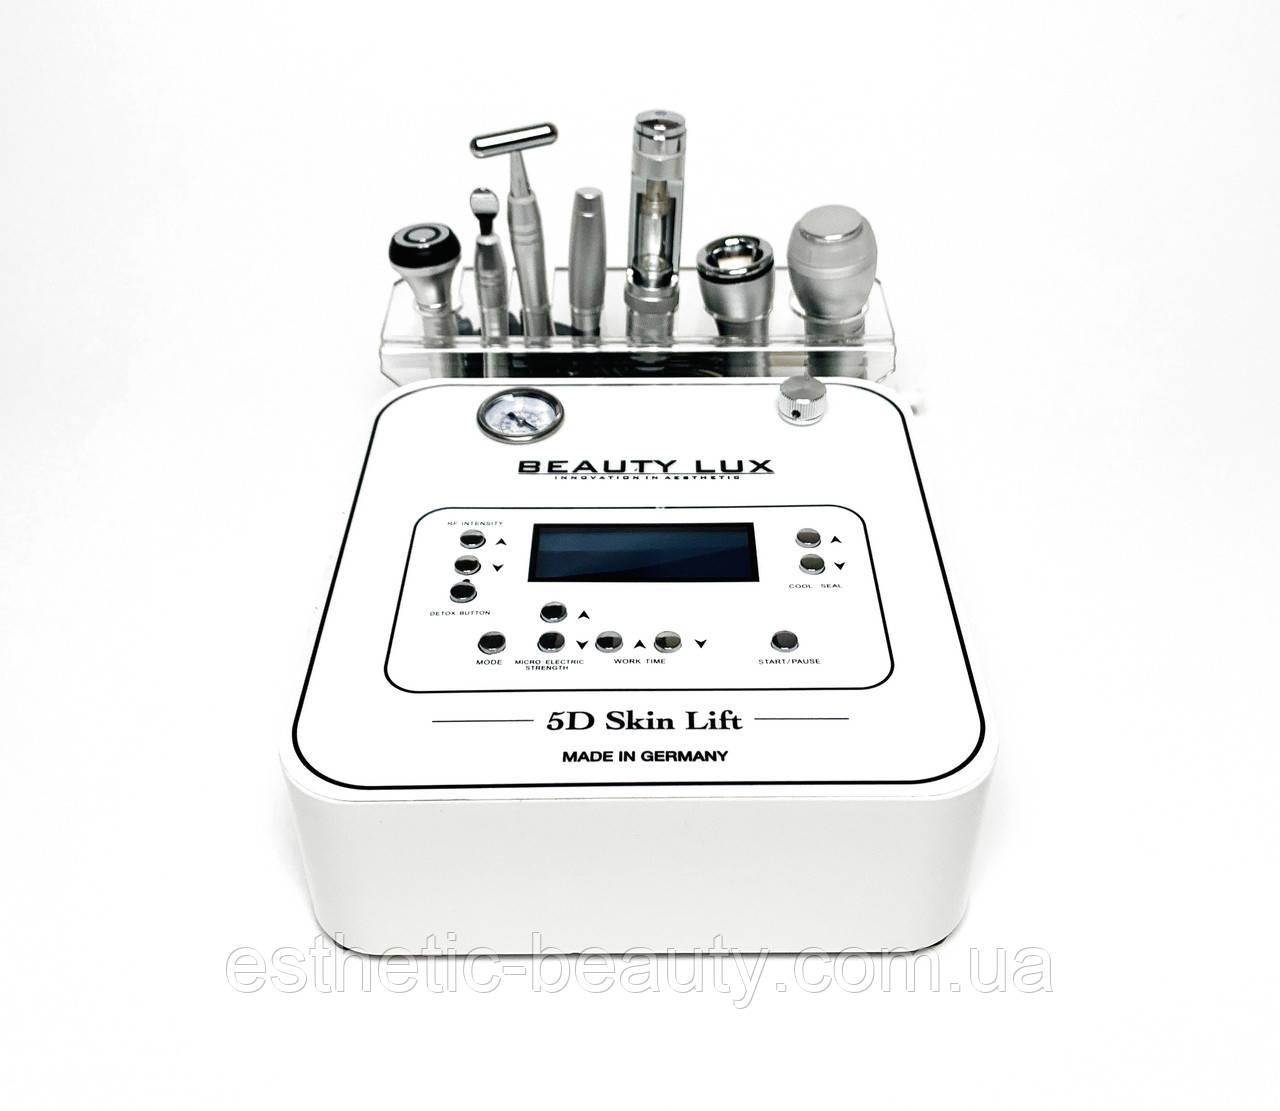 Аппарат Вакуумного массажа, Микротоковой терапии, Электропорации BEAUTY LUX 5D Skin Lift